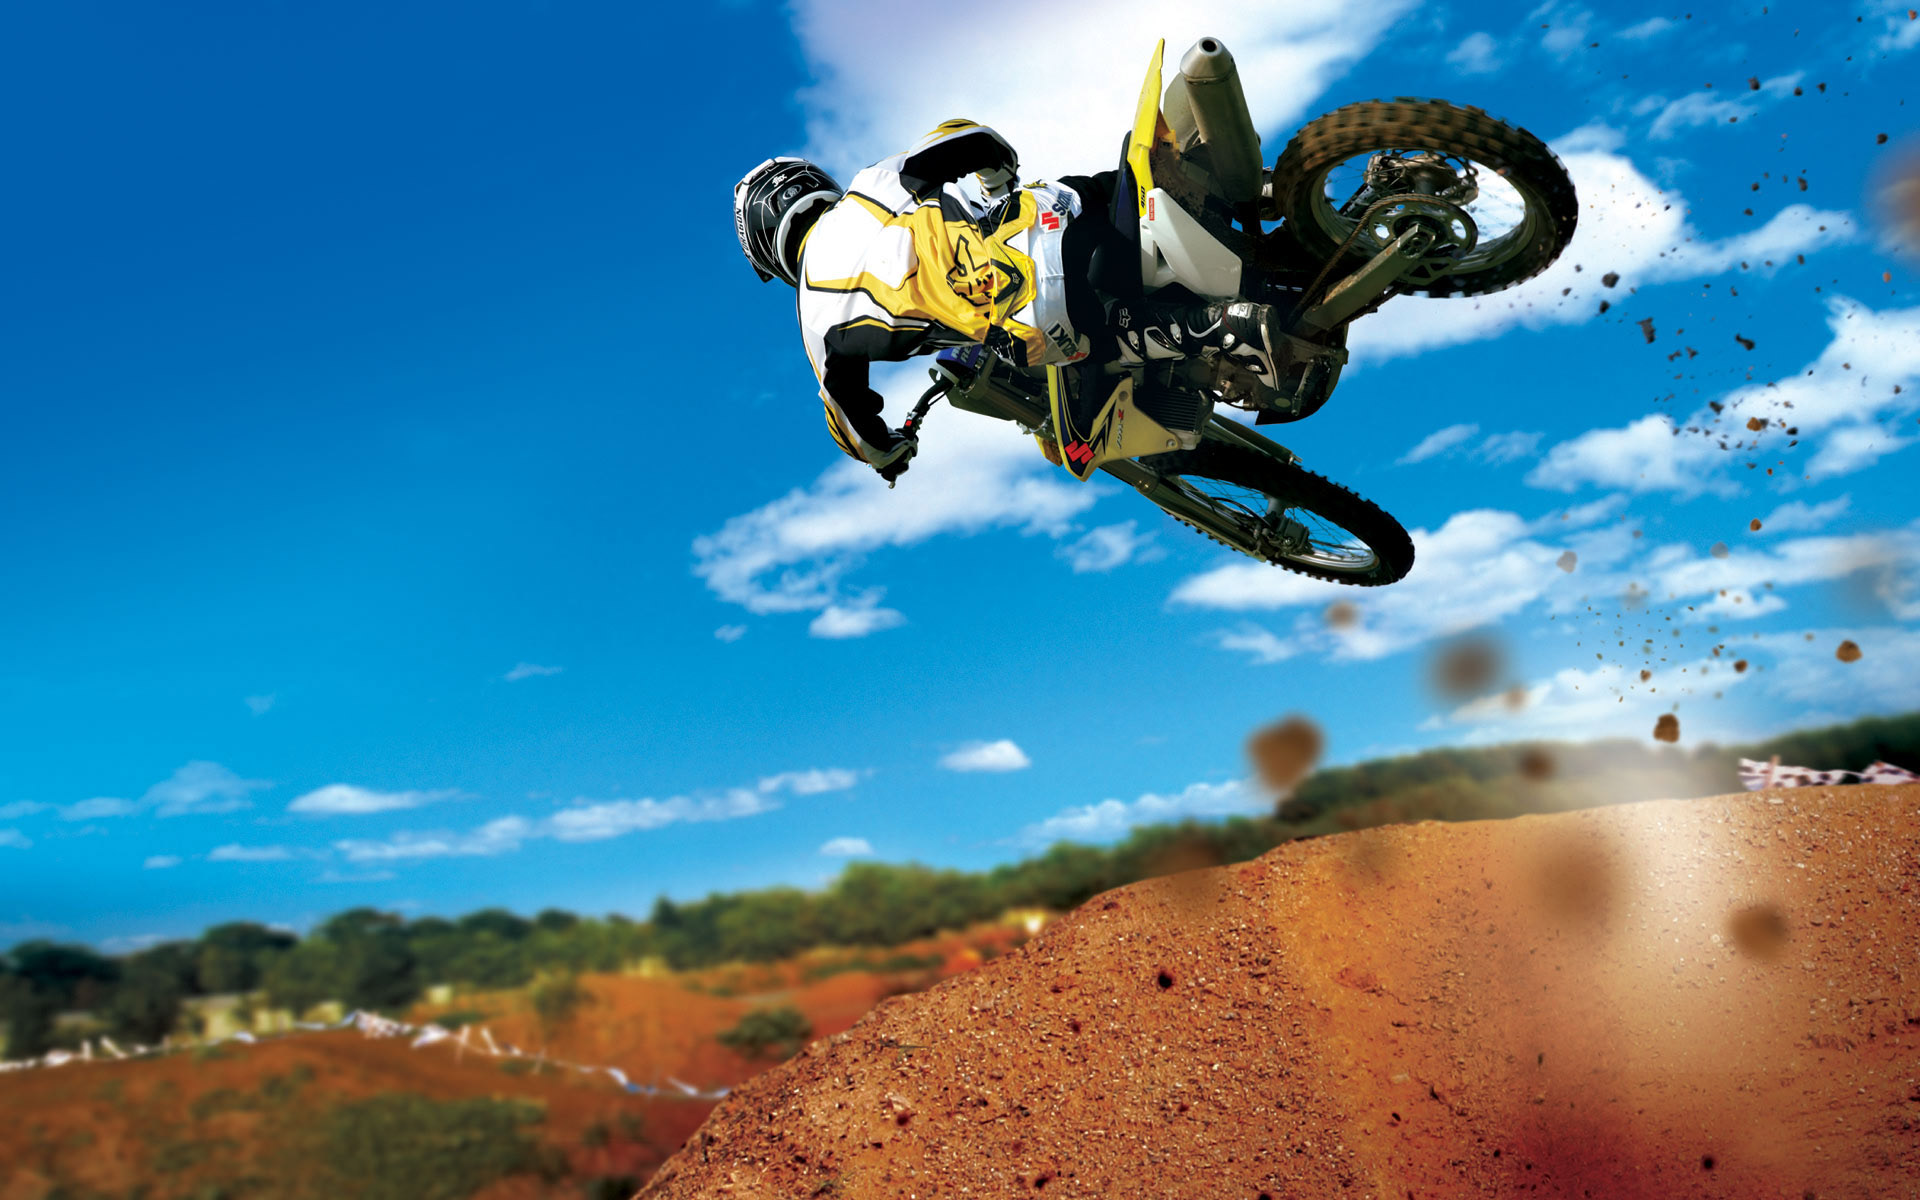 Motocross Stunt Wallpapers HD Wallpapers 1920x1200